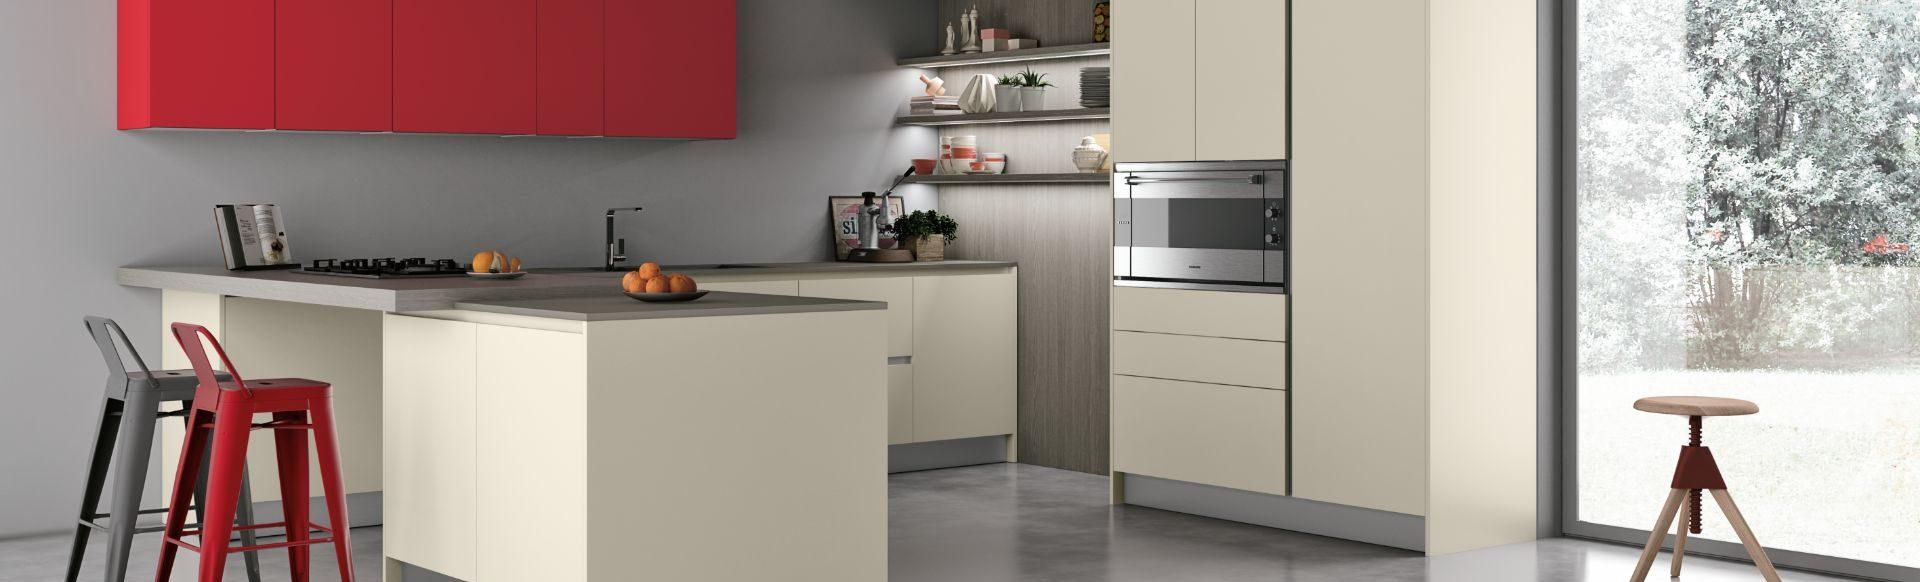 slider-cocina-cromatika-2